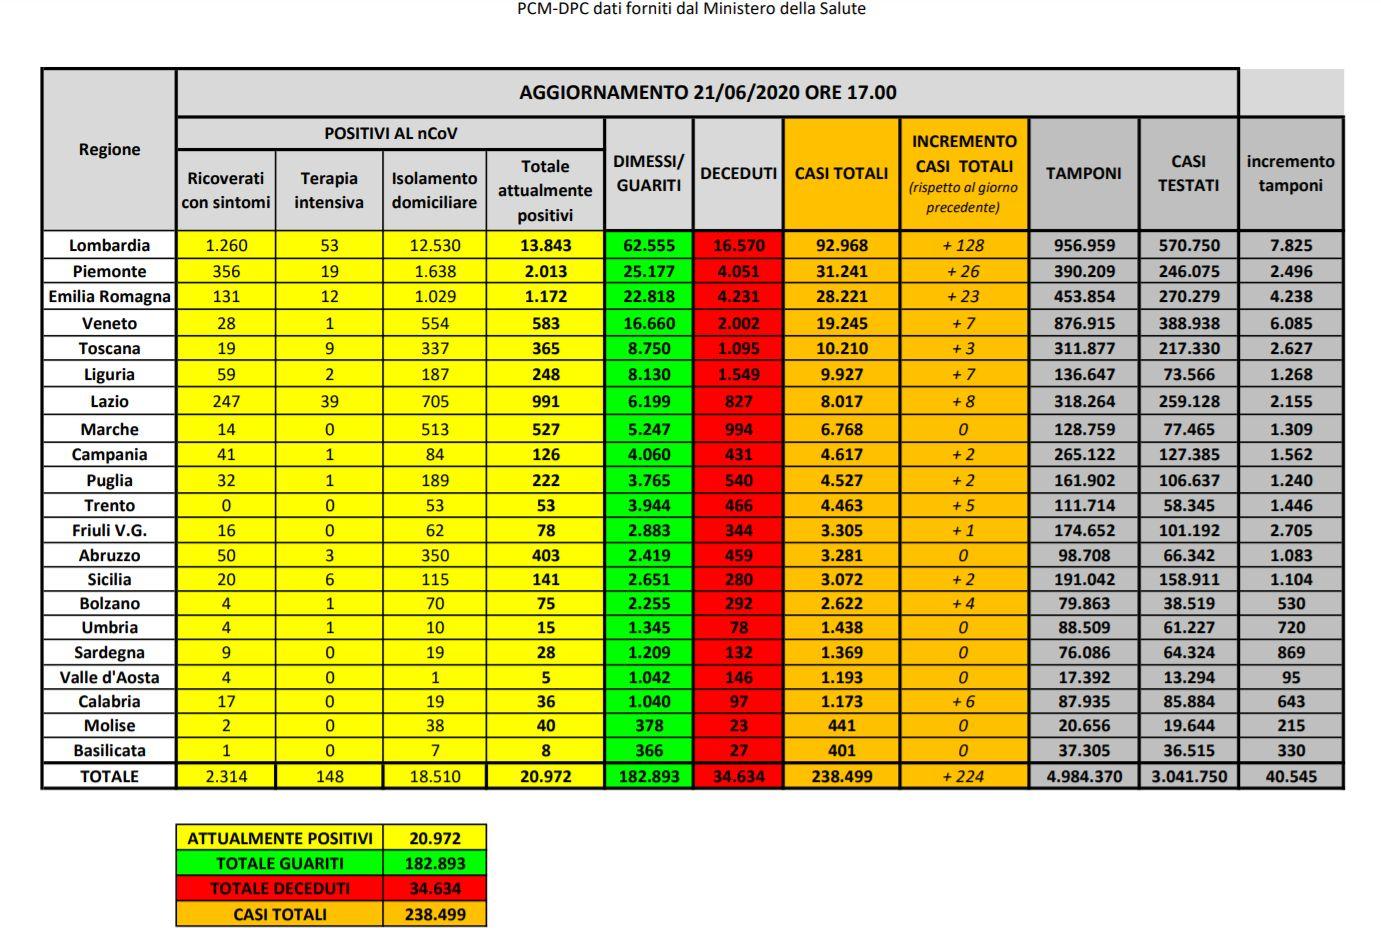 Coronavirus: da ieri 224 nuovi casi e 24 deceduti in Italia